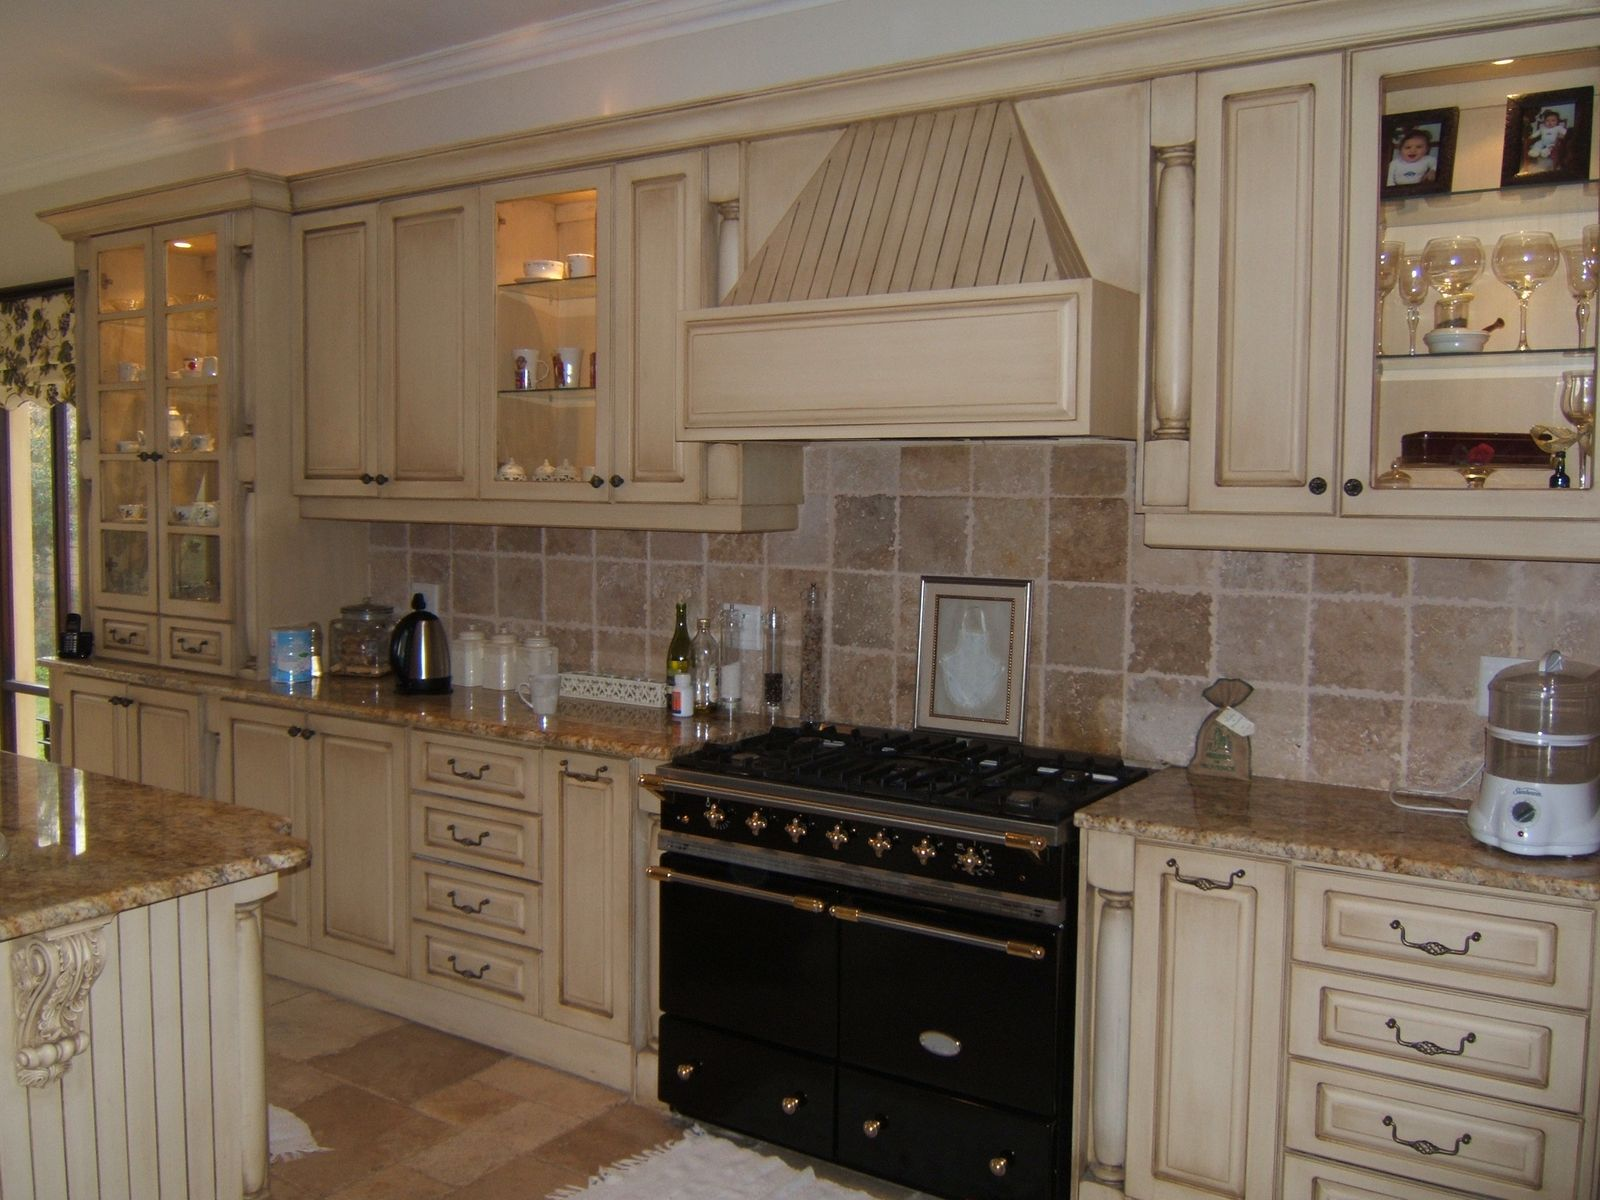 Kitchen Cabinet Wall Tiles 1600x1200 Wallpaper Teahub Io